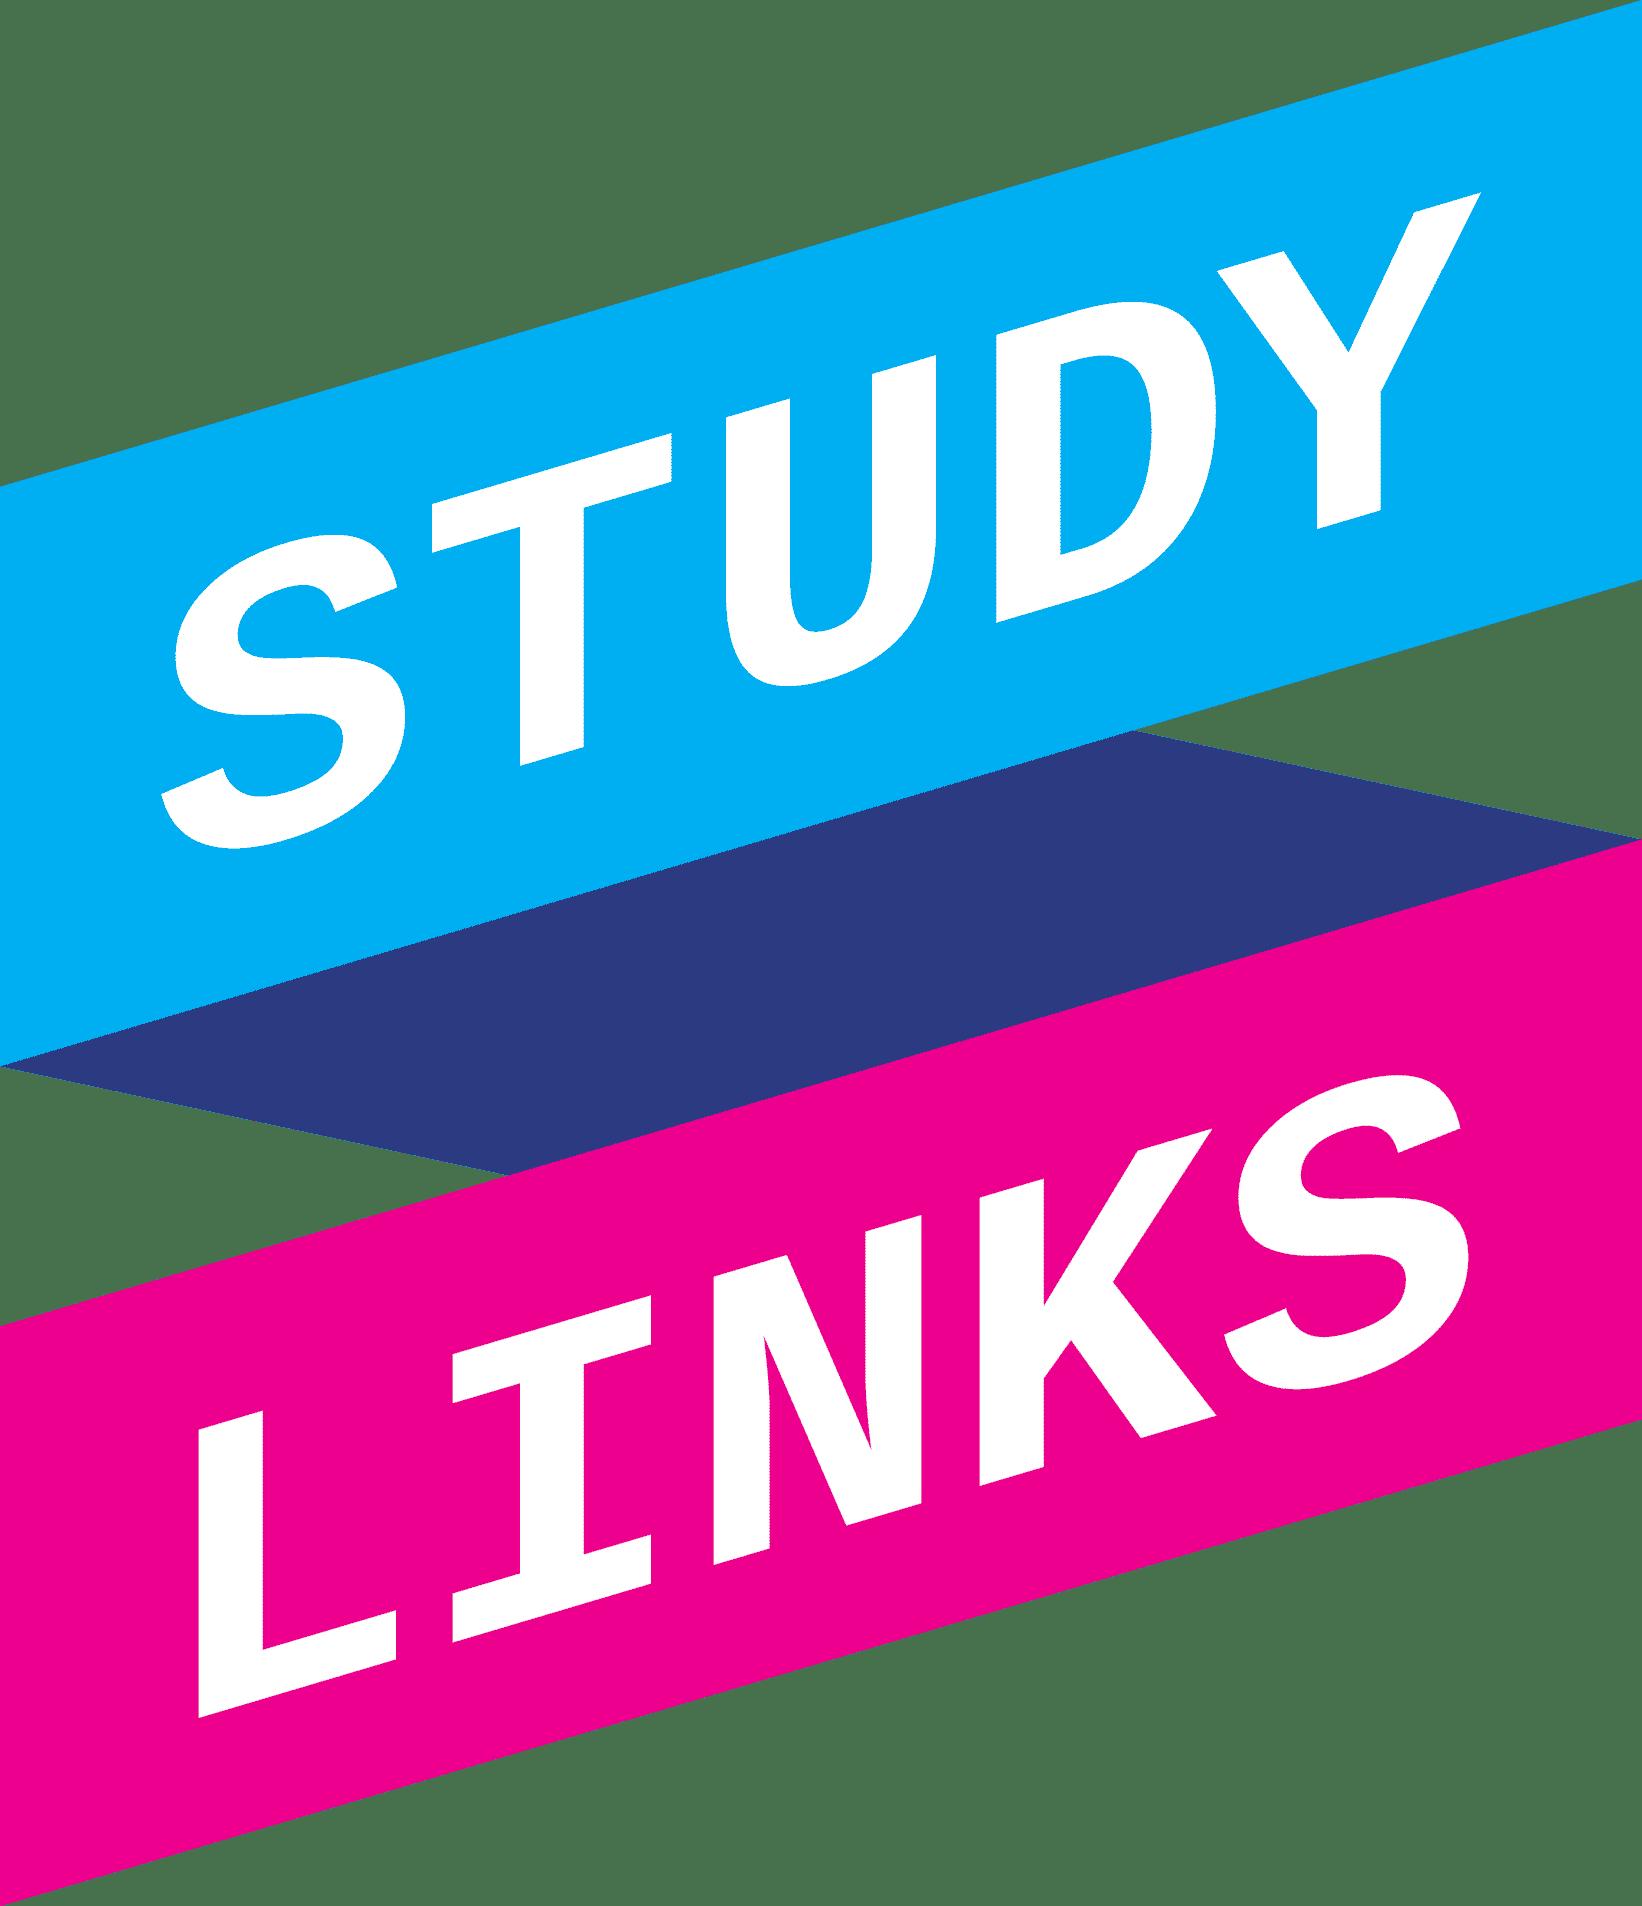 Study-Links-Logo-448x249-c-default.png